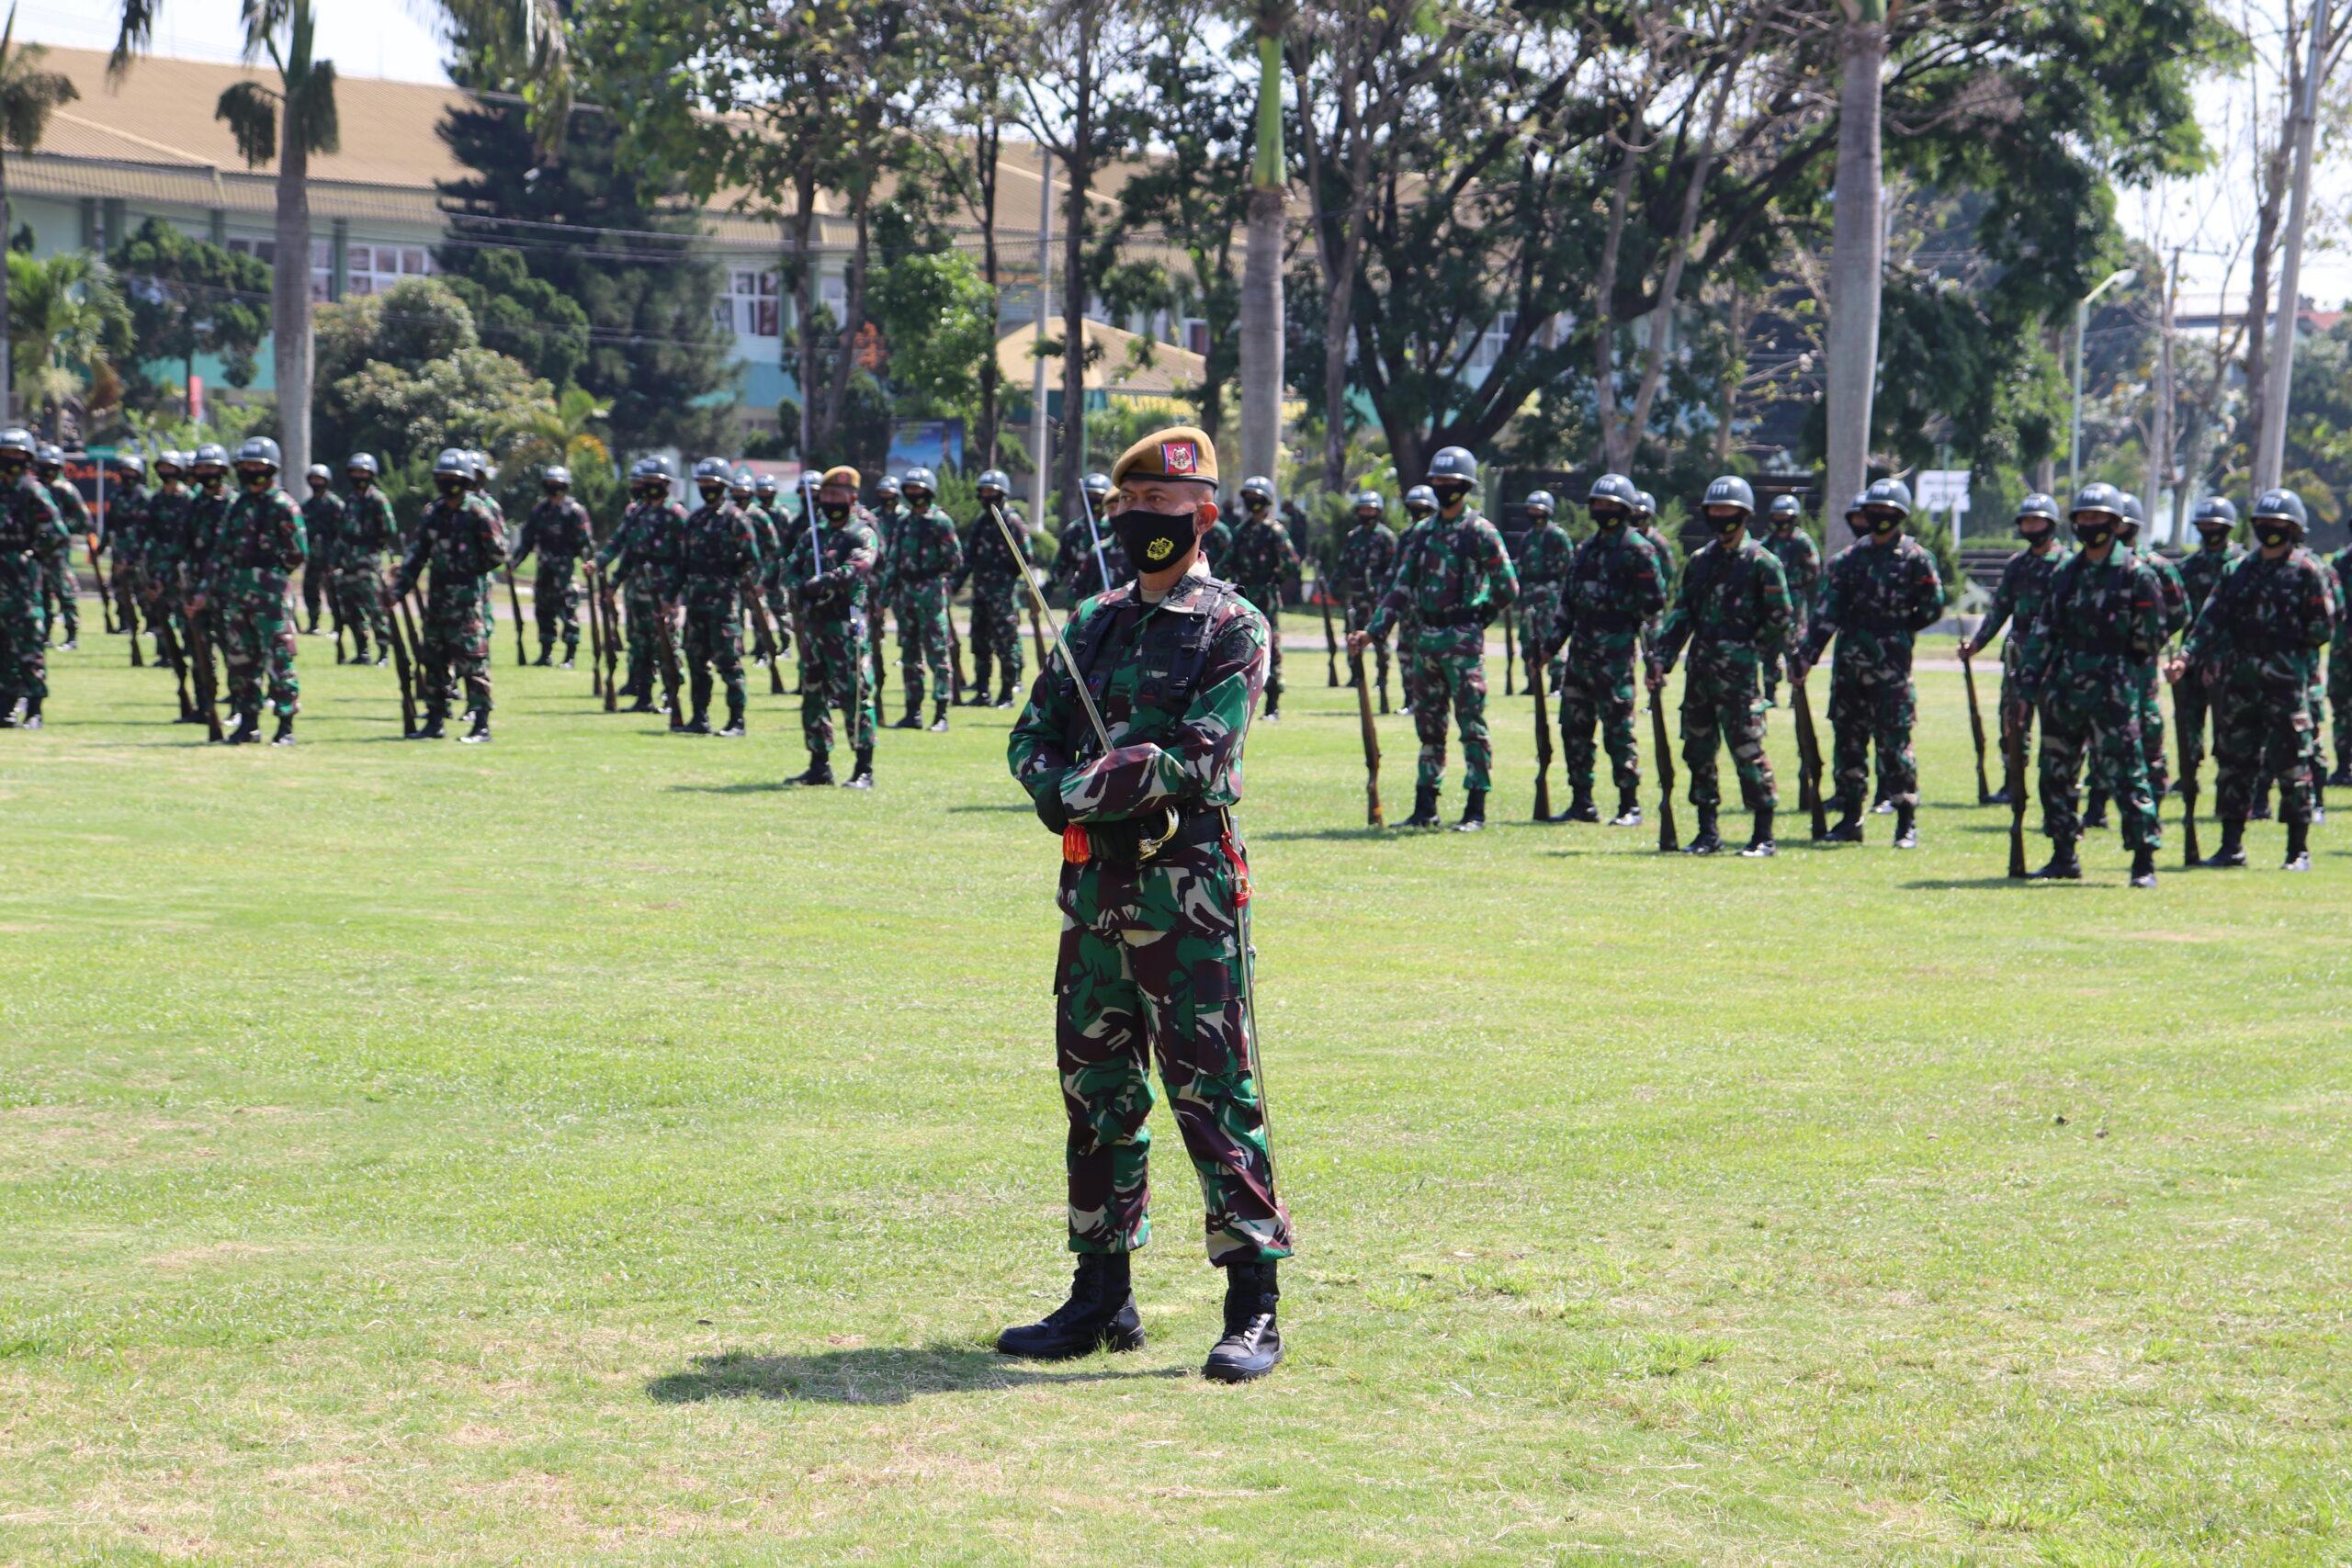 UPACARA PEMBUKAAN DIKJURTA ARHANUD ABIT DIKMATA TNI AD TA 2020